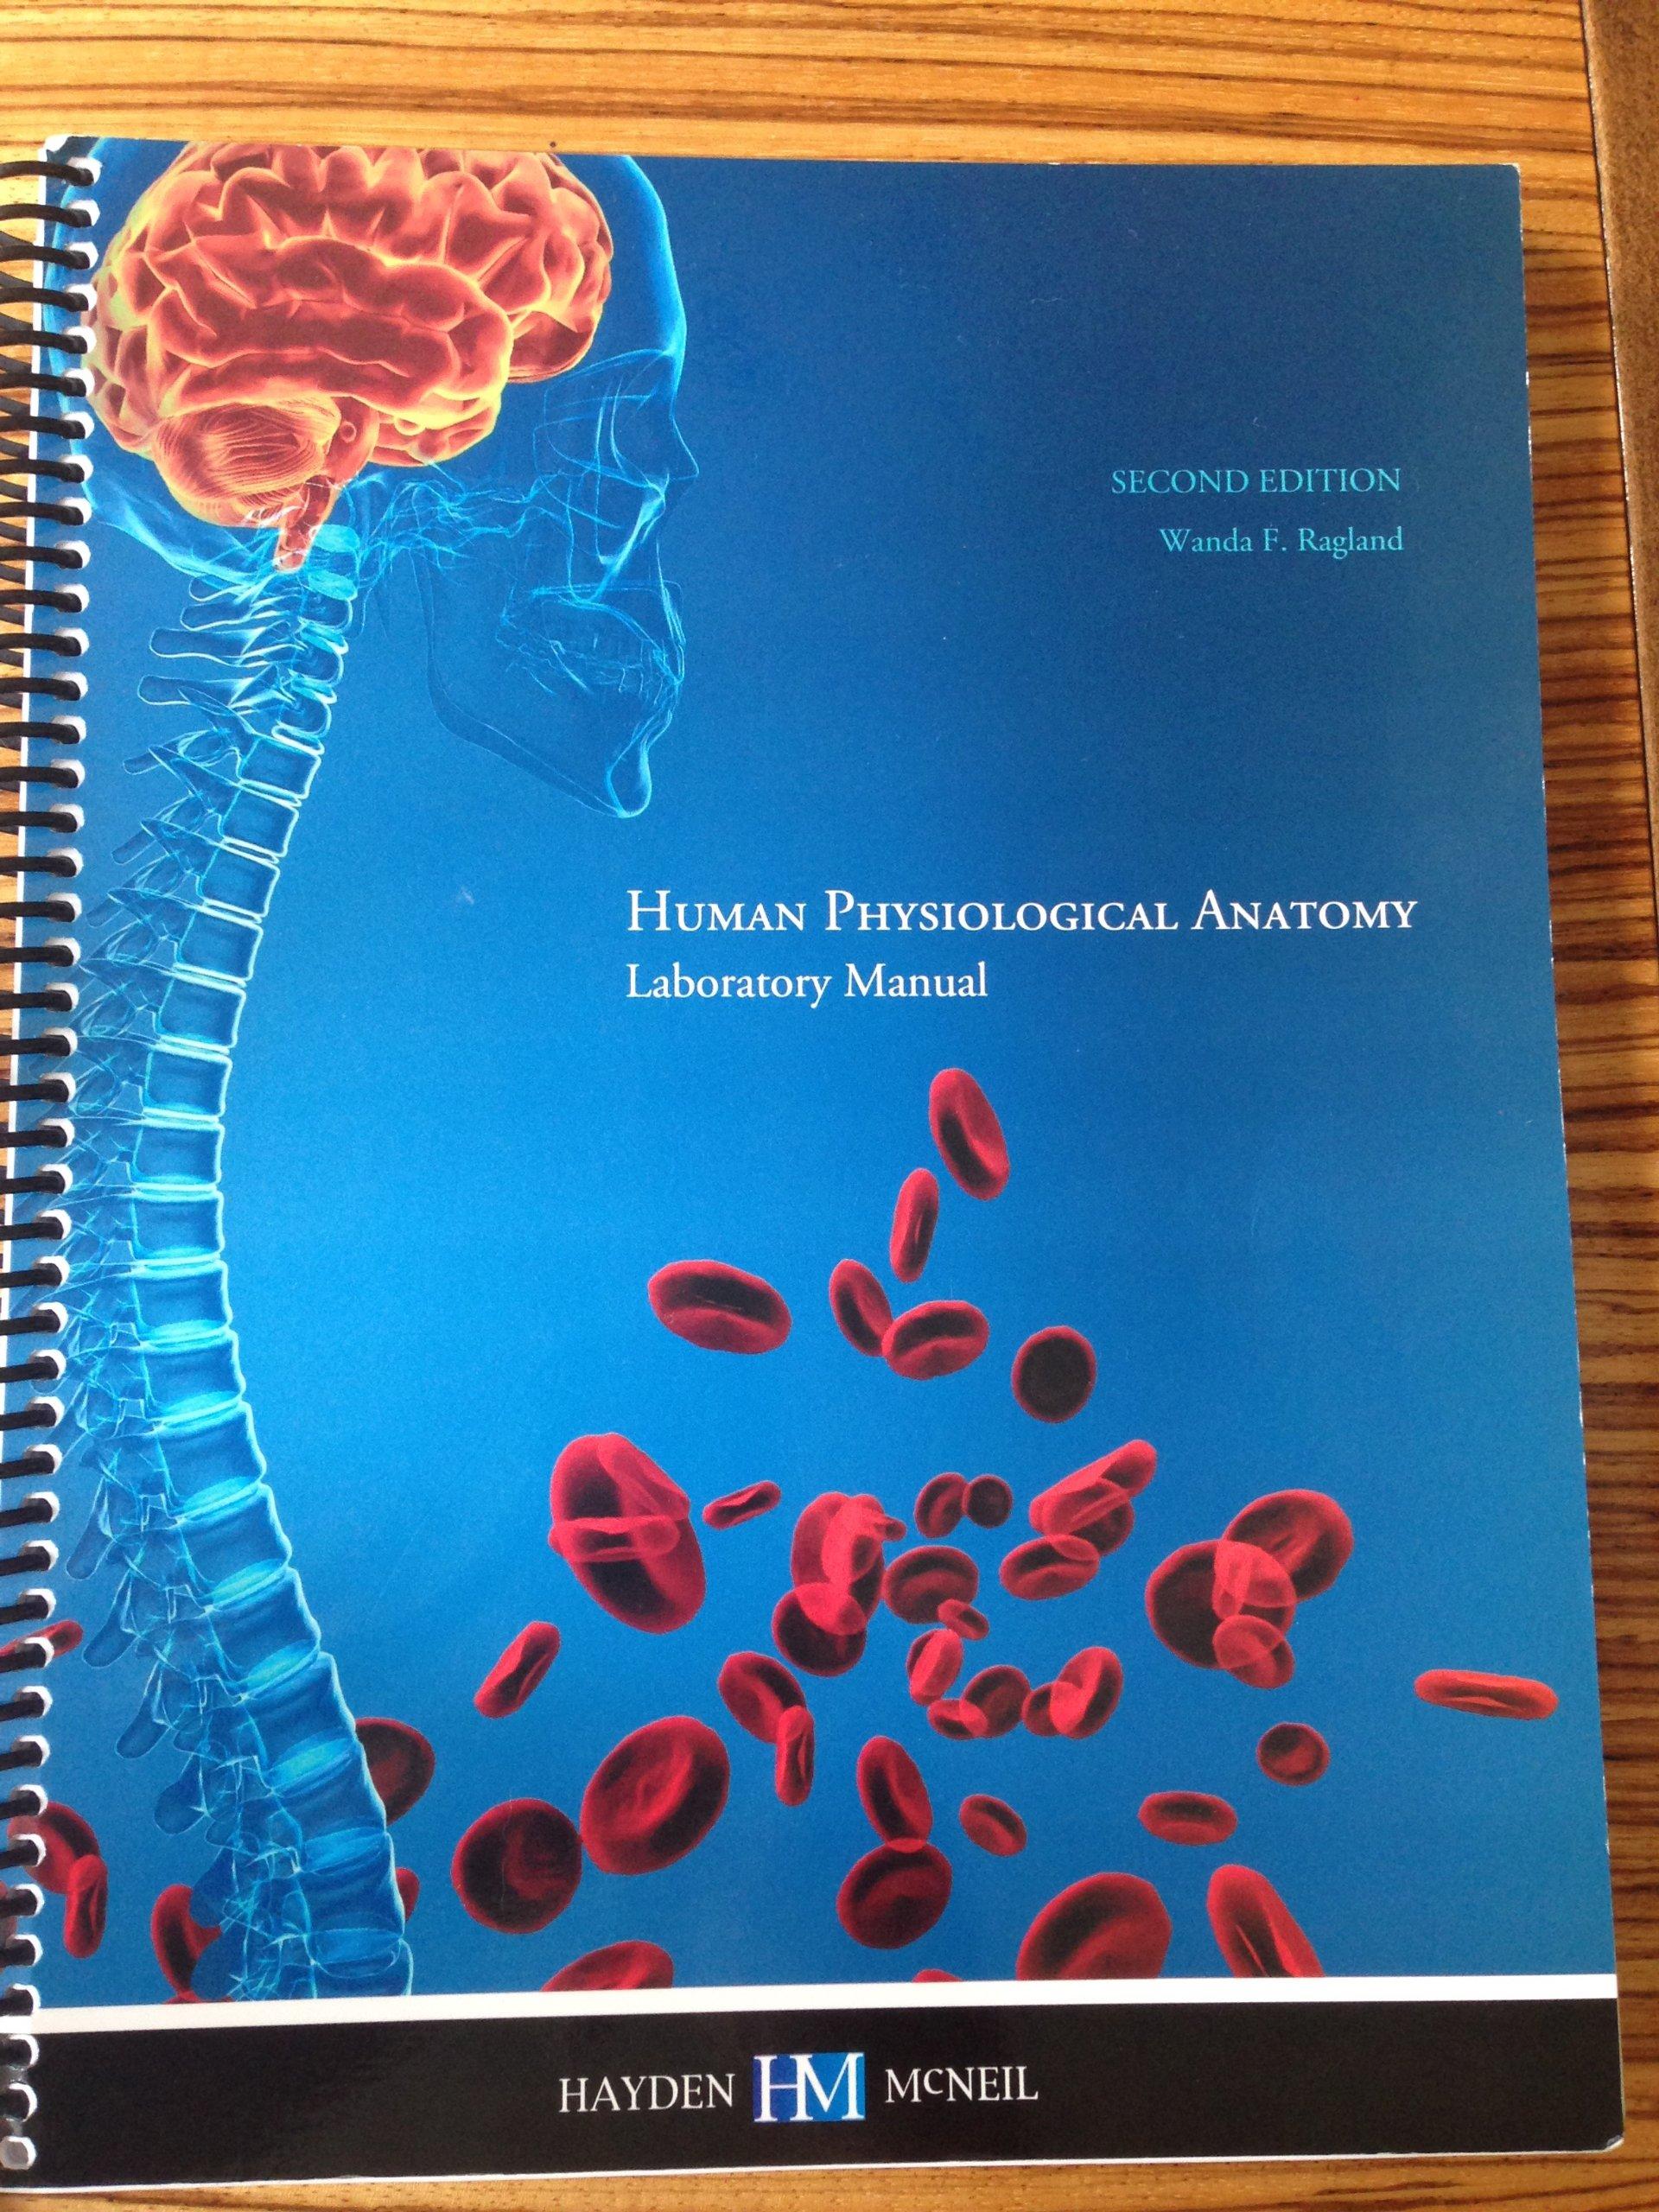 Human Physiological Anatomy (Laboratory Manual) 2nd Edition (Hayden ...